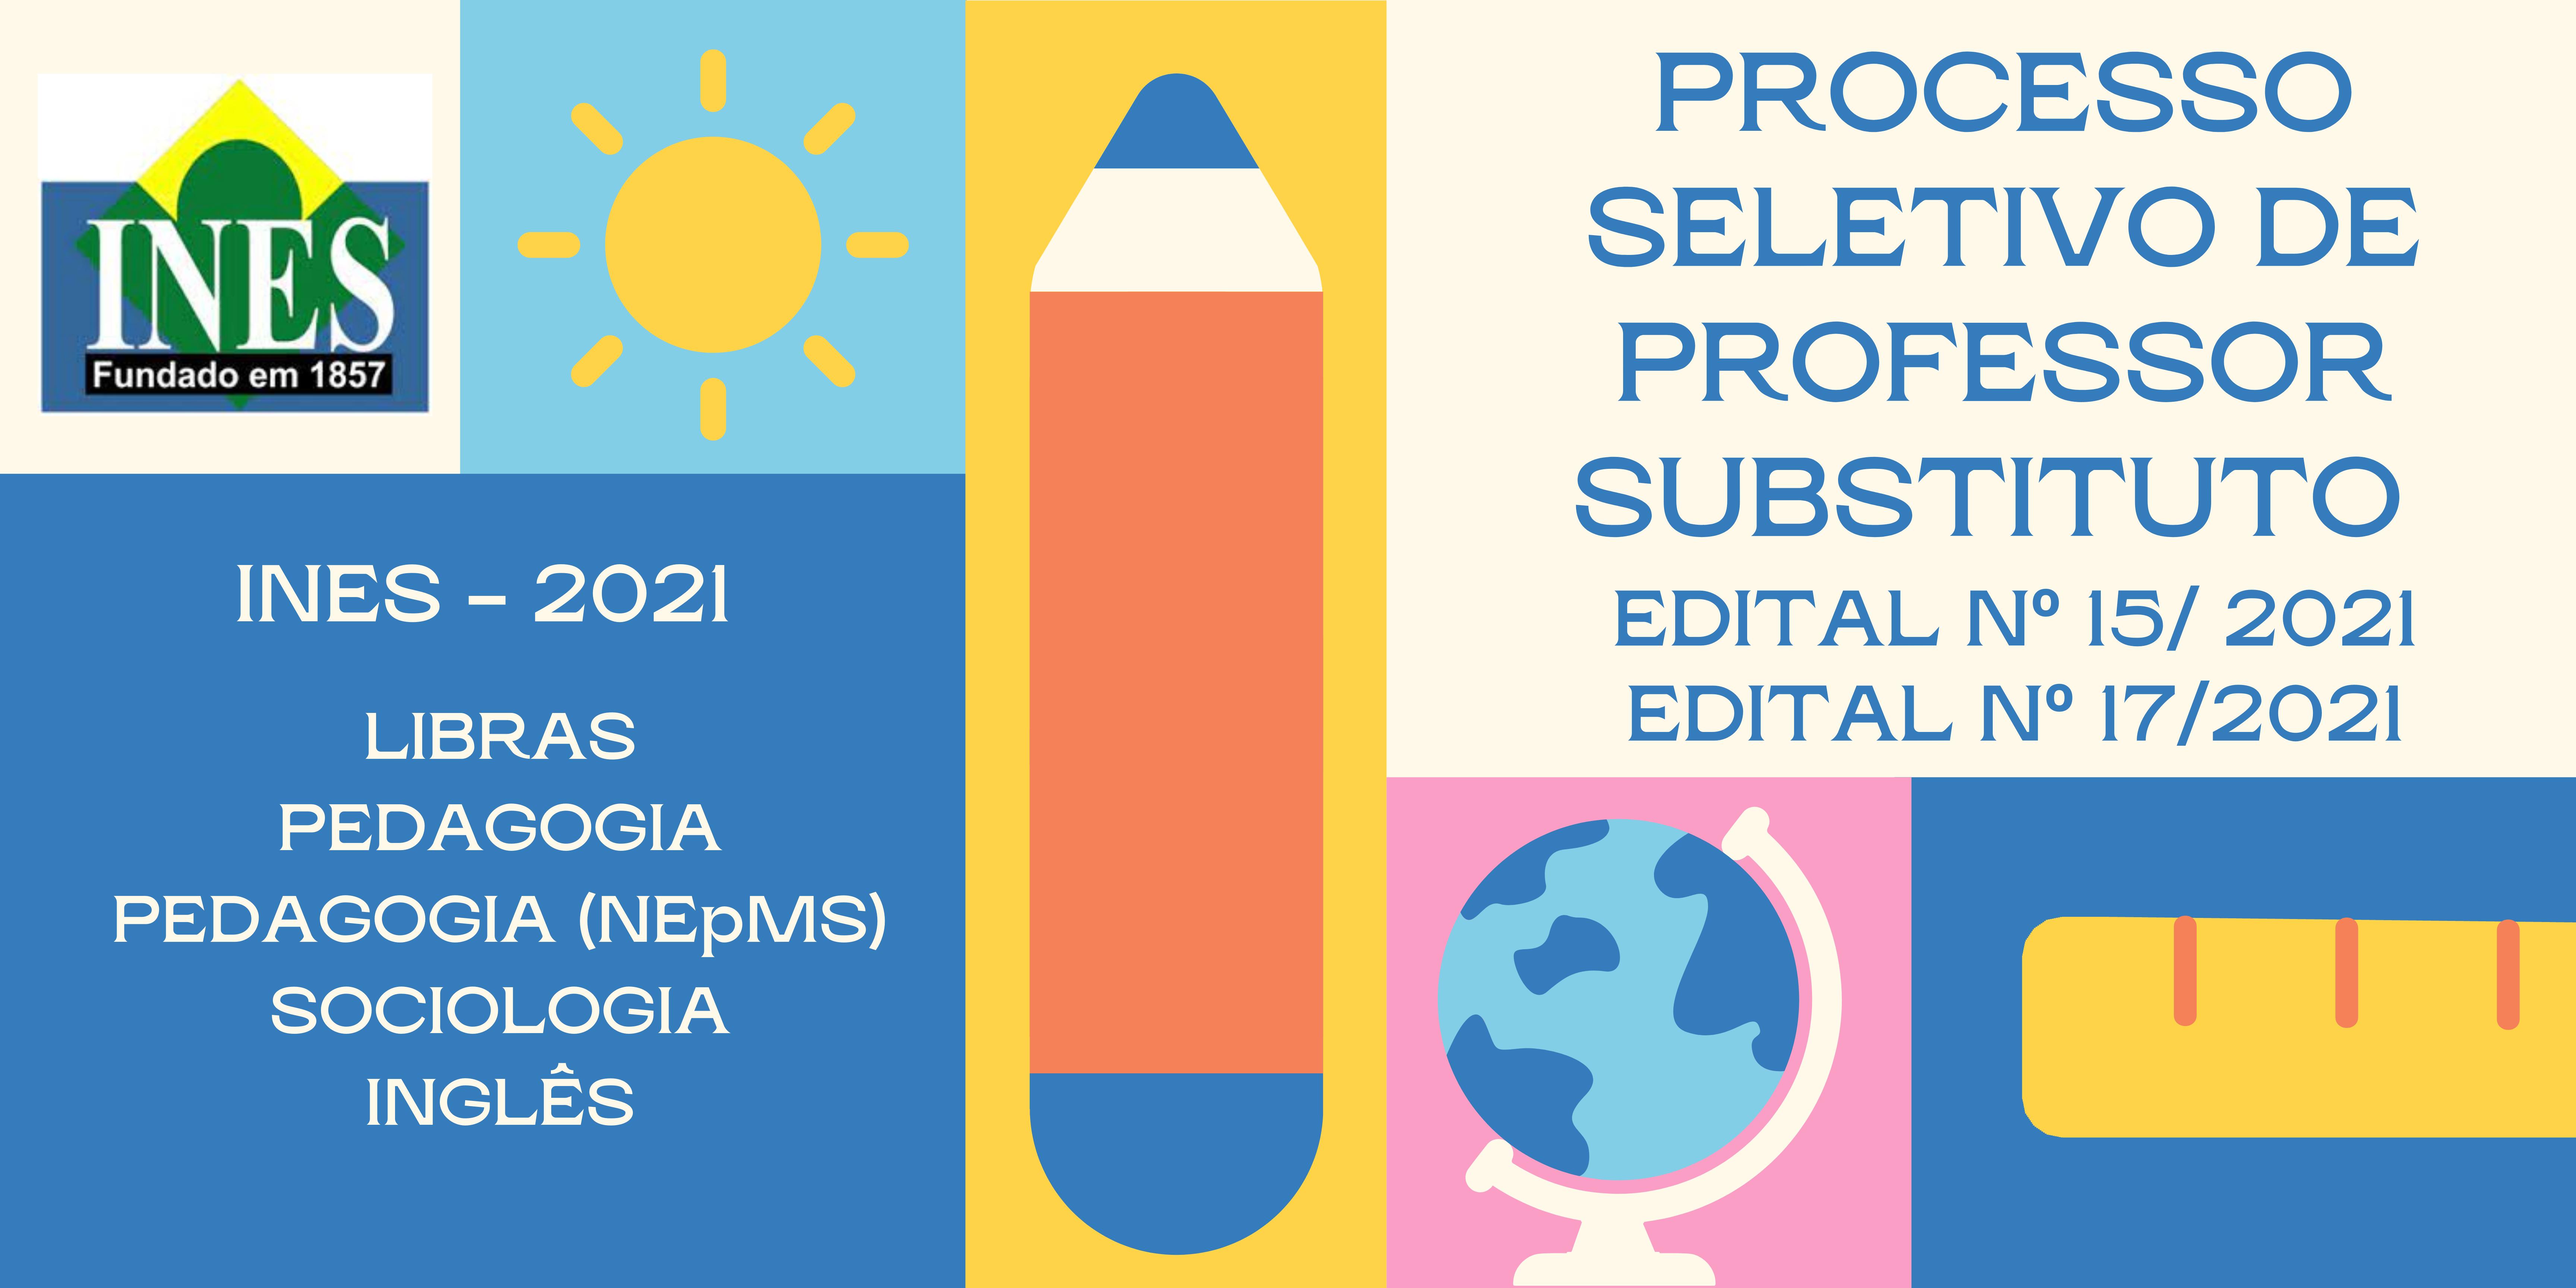 PROCESSO SELETIVO DE PROFESSOR SUBSTITUTO - EDITAL Nº 15 E 17 / 2021